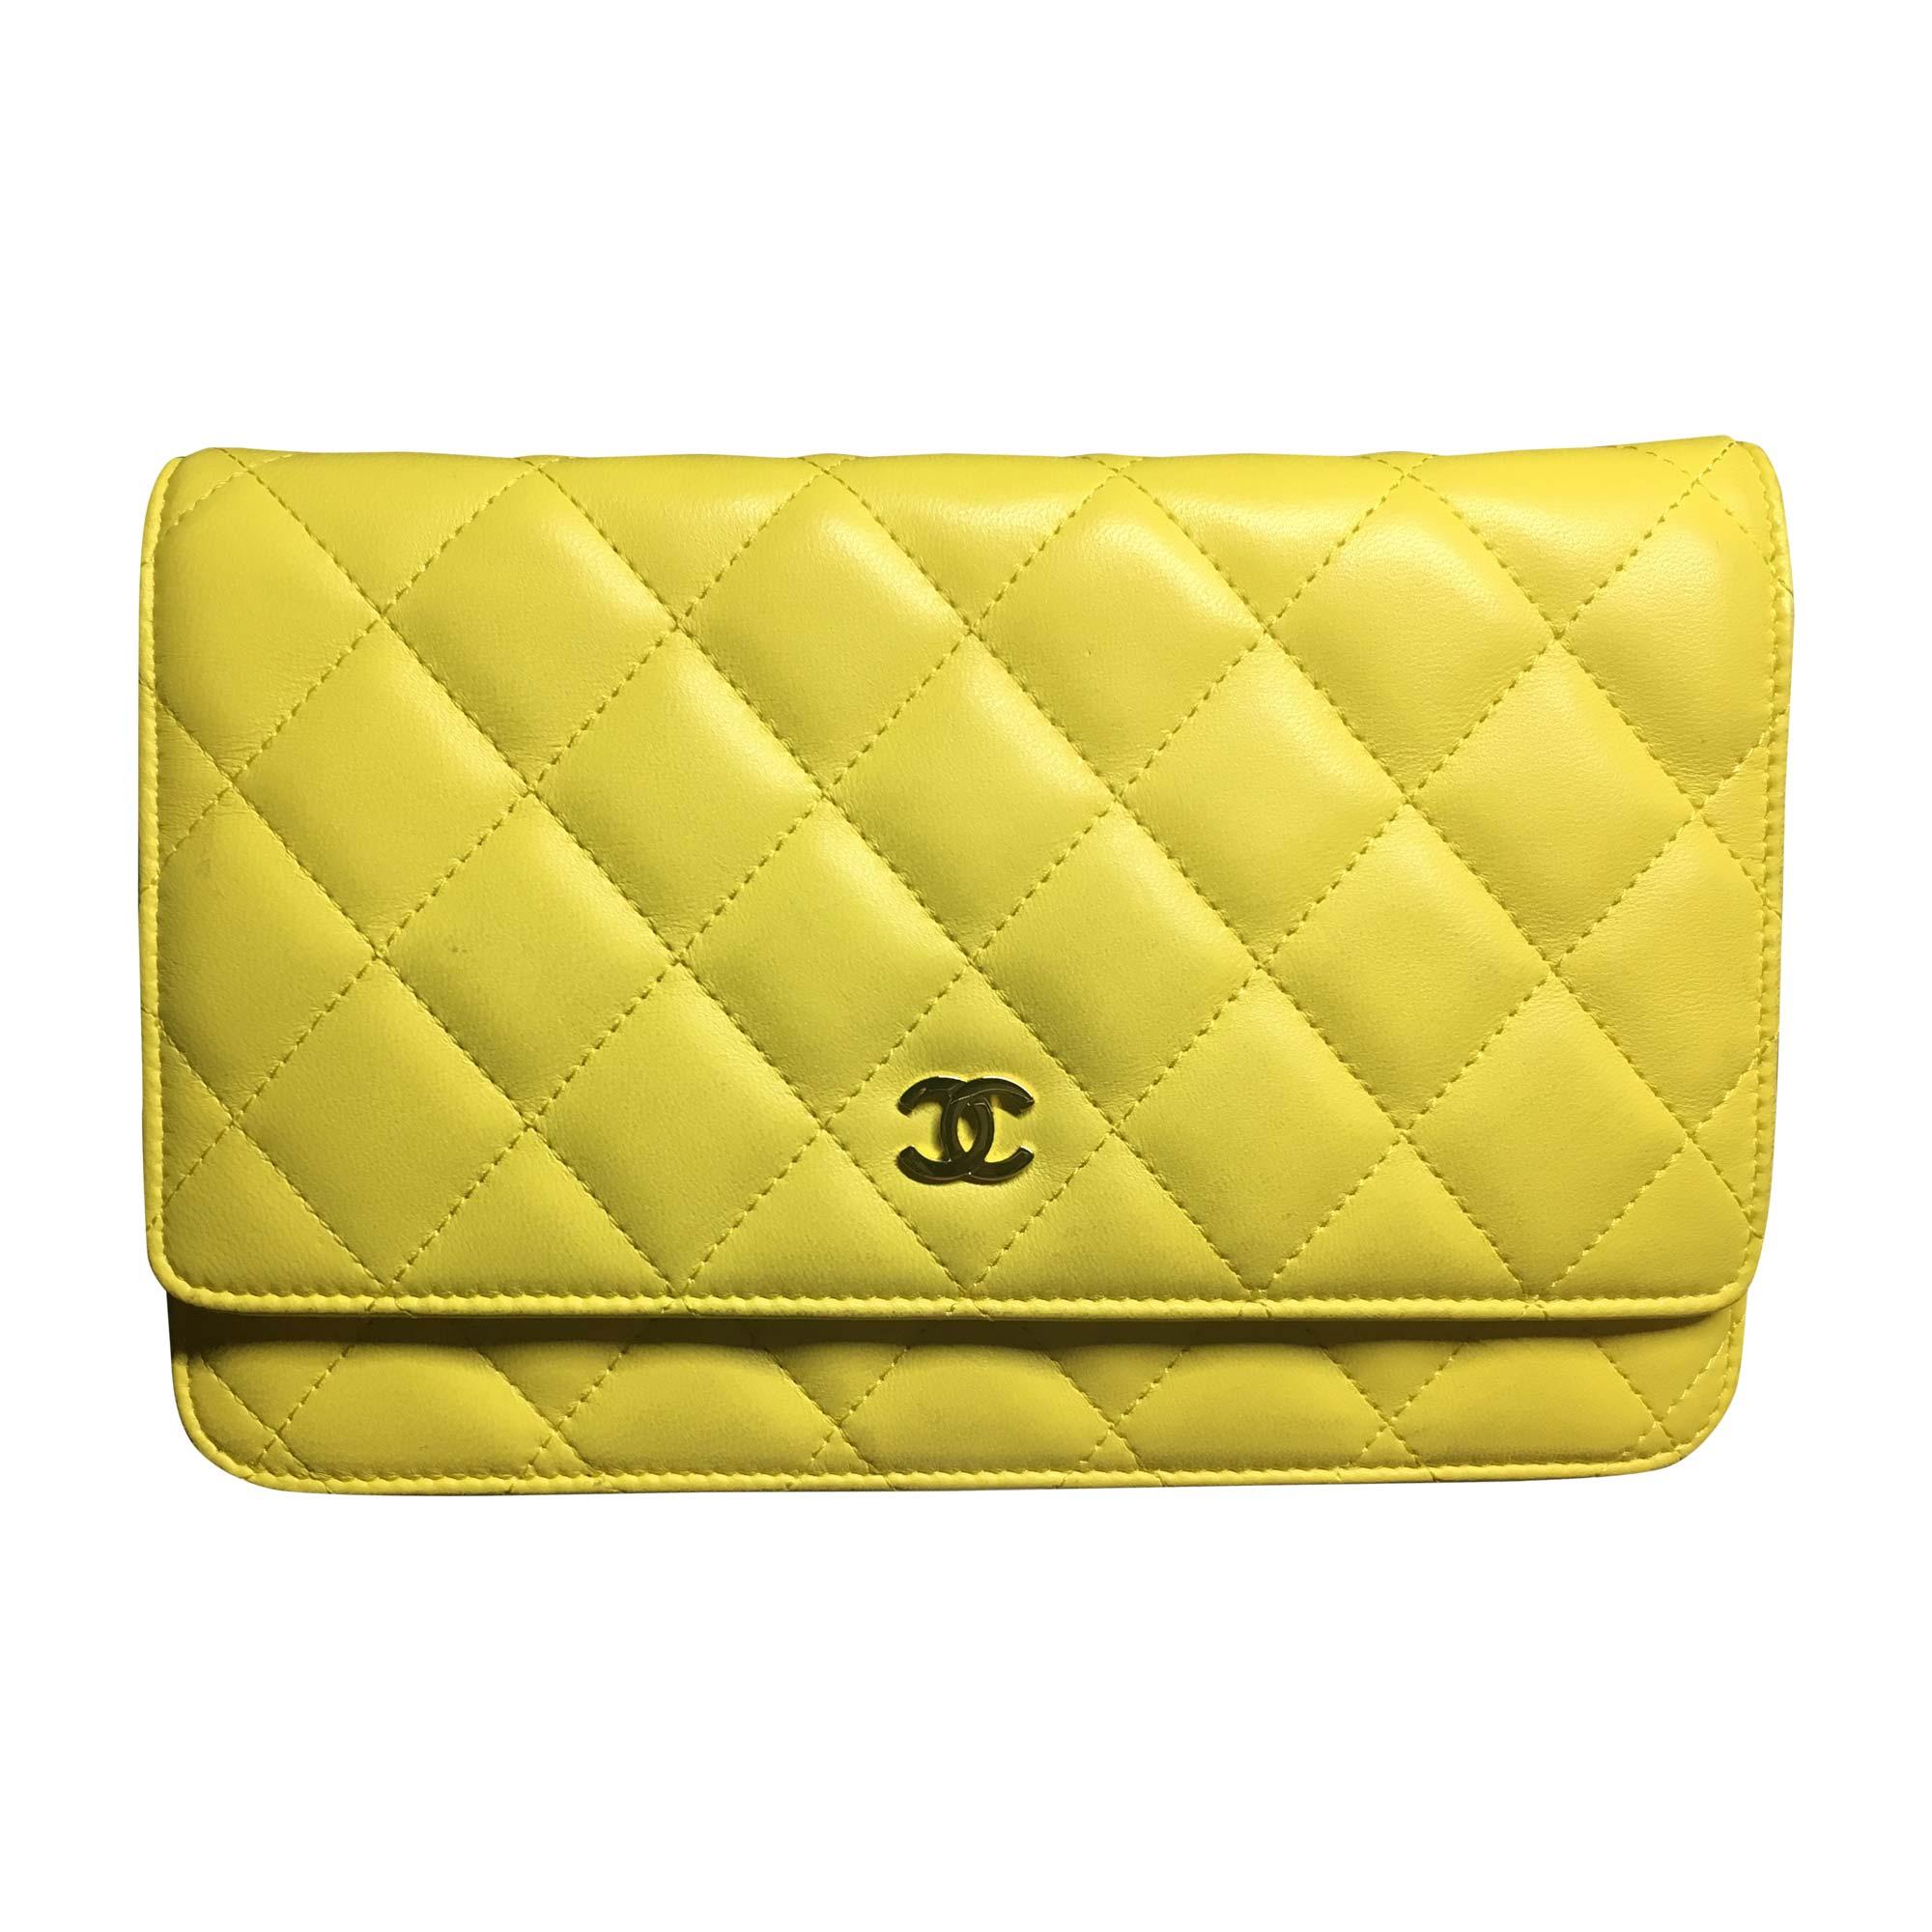 47a86488eb0b Leather Clutch CHANEL yellow vendu par Laura 6079 - 6521387